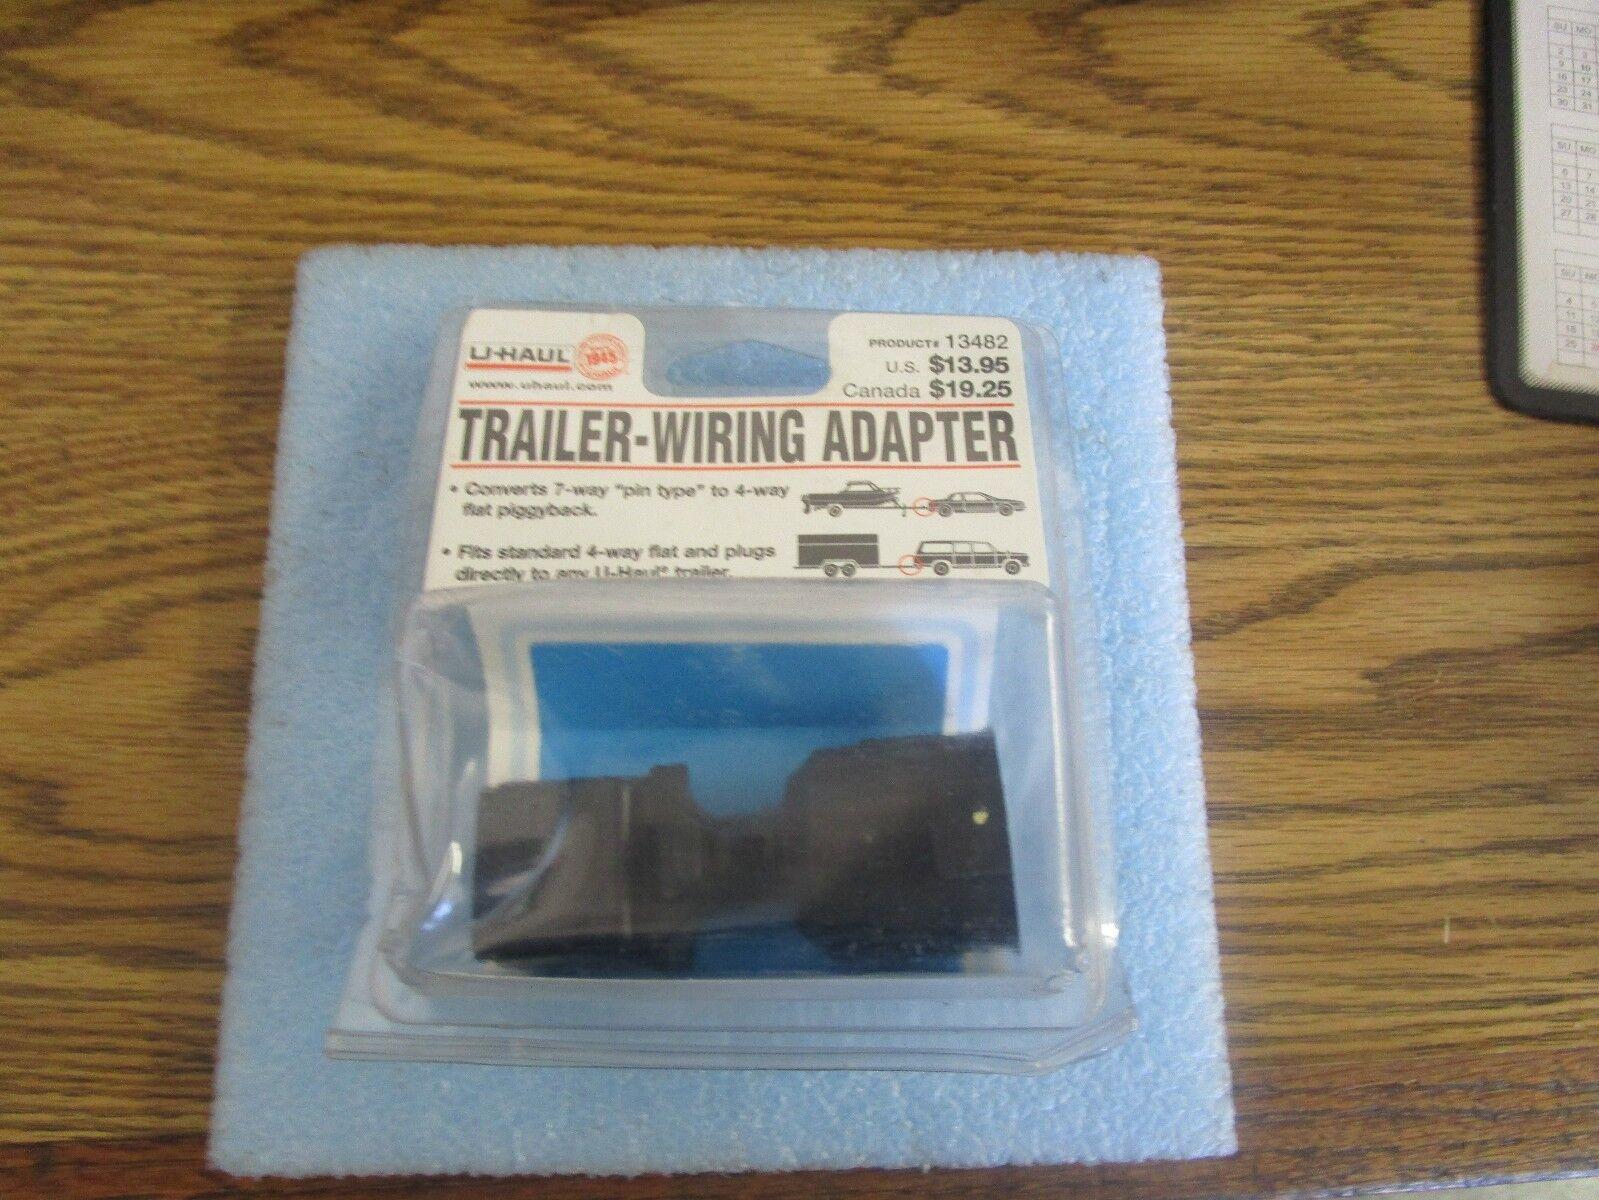 13482 Trailer Wiring Adapter 7 Pin To 4 Way Flat Piggyback U Haul Ebay Uhaul